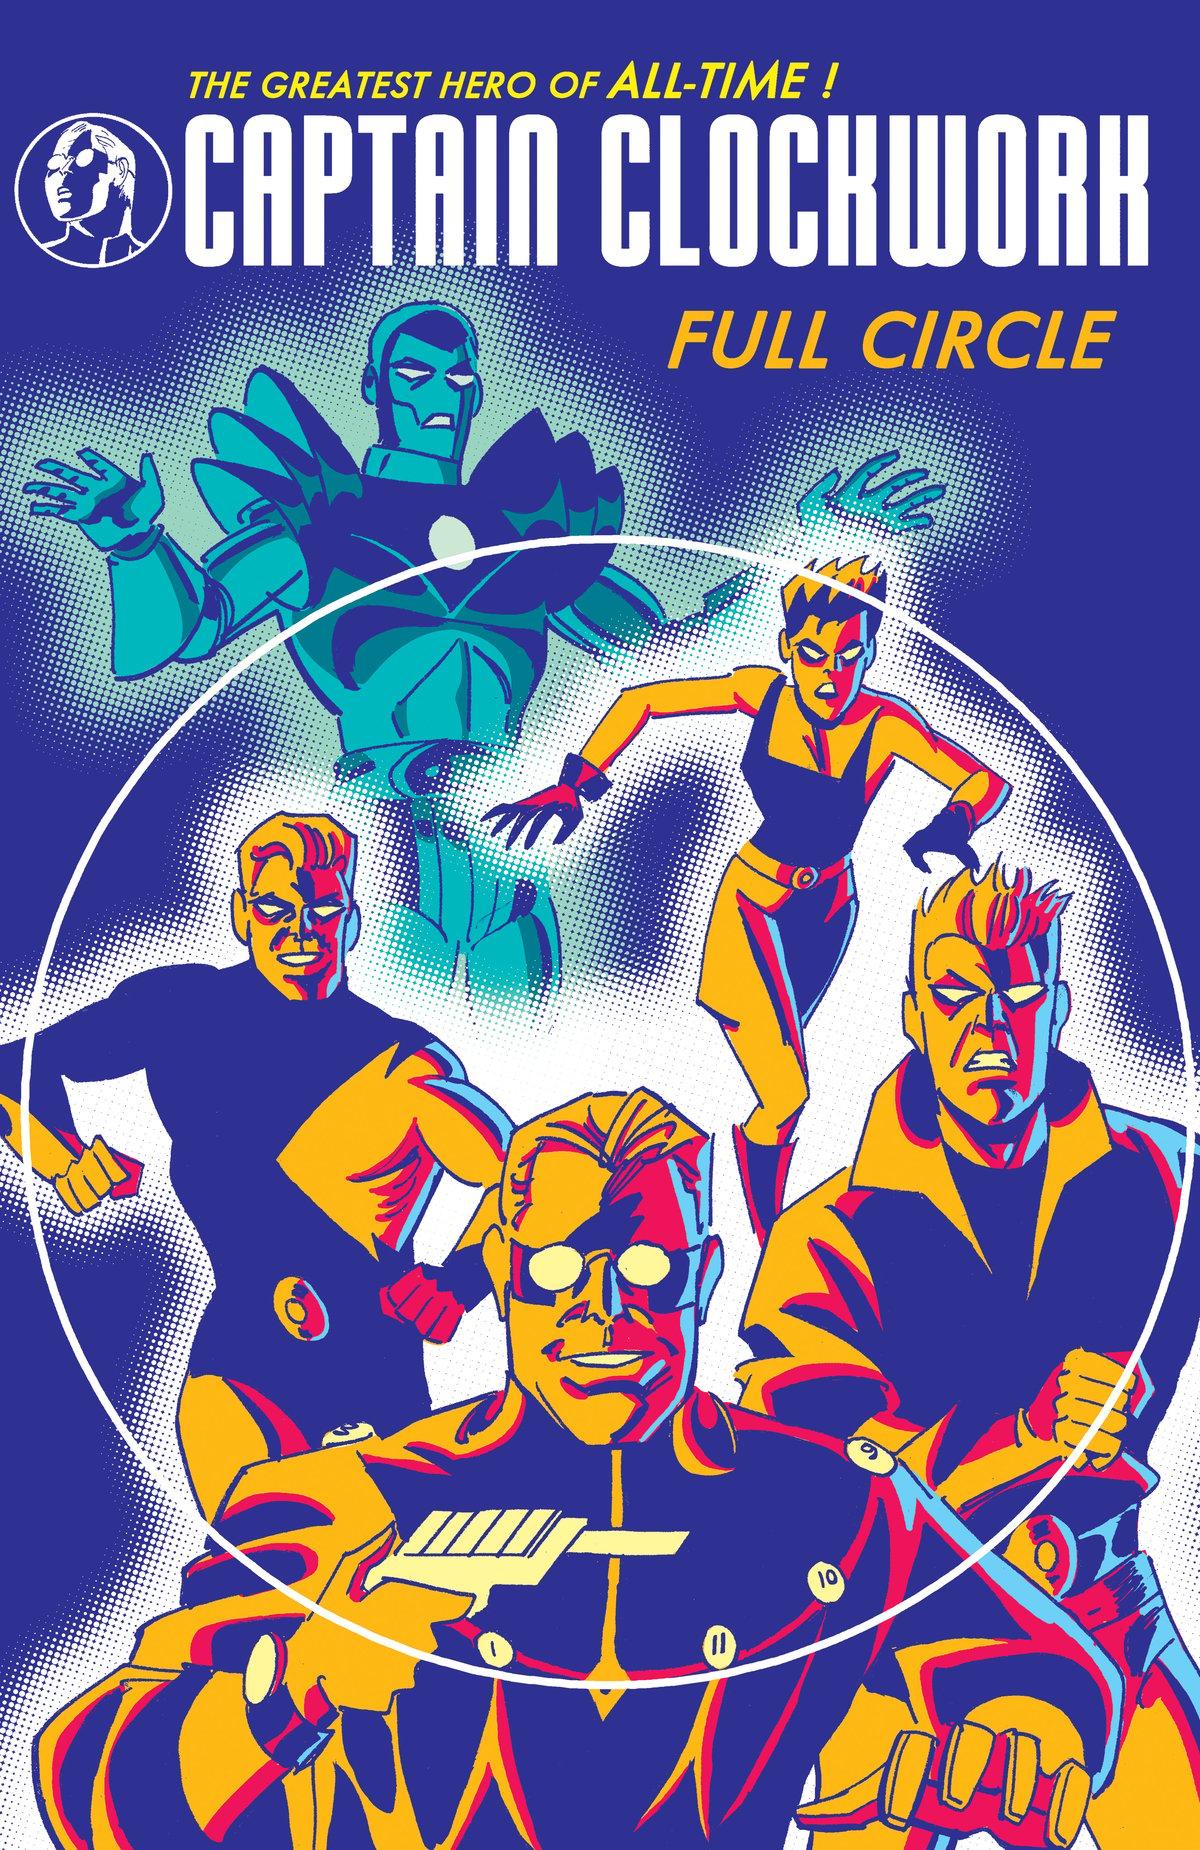 Image of Captain Clockwork: Full Circle